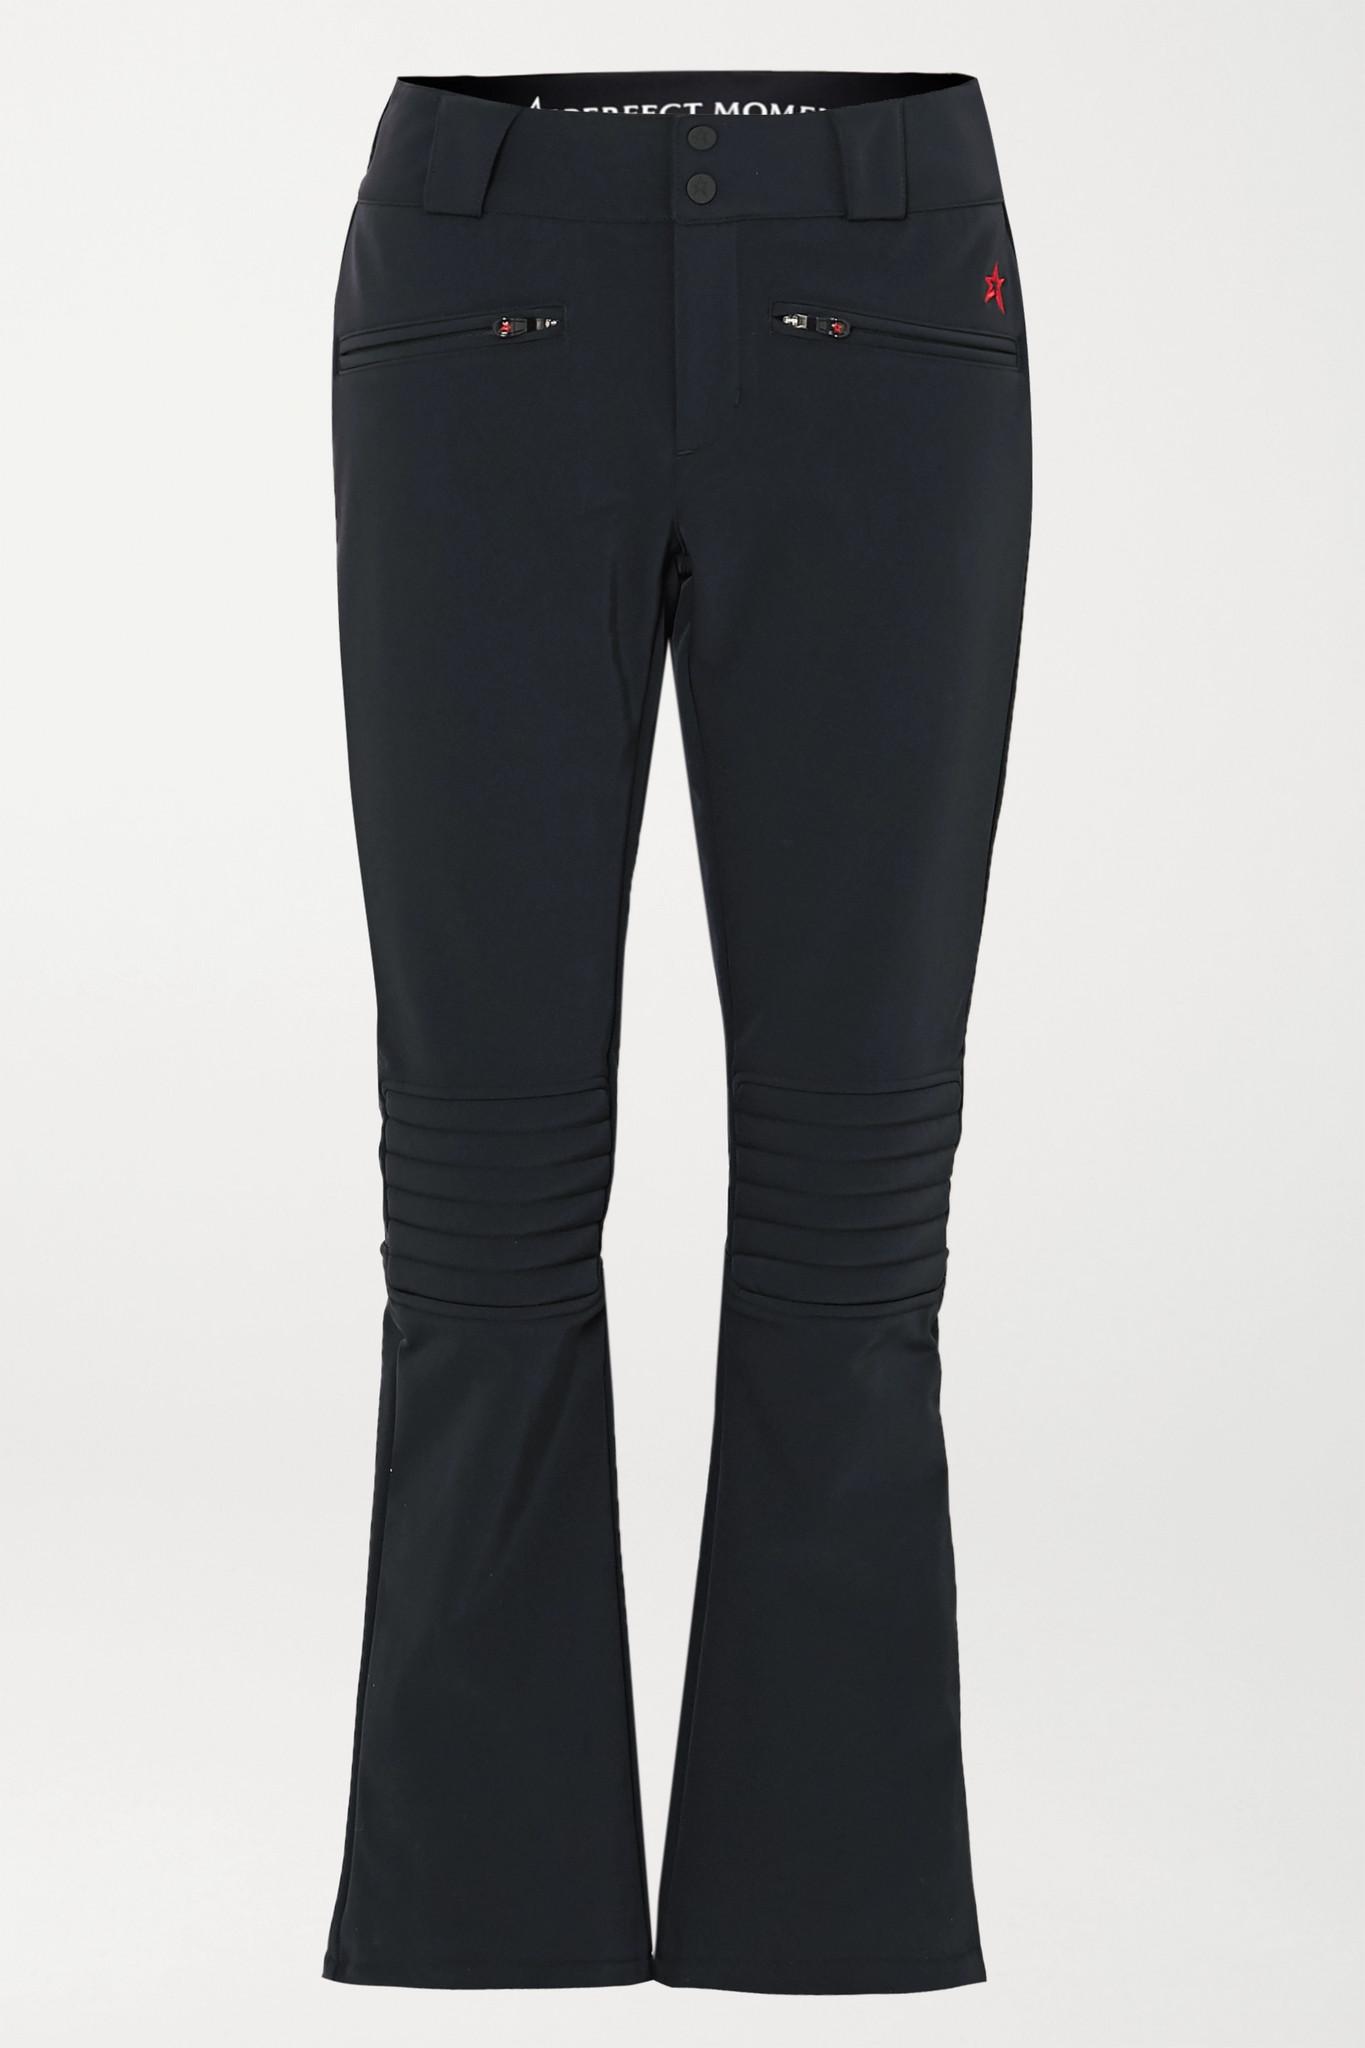 PERFECT MOMENT - Aurora Flared Ski Pants - Black - x small